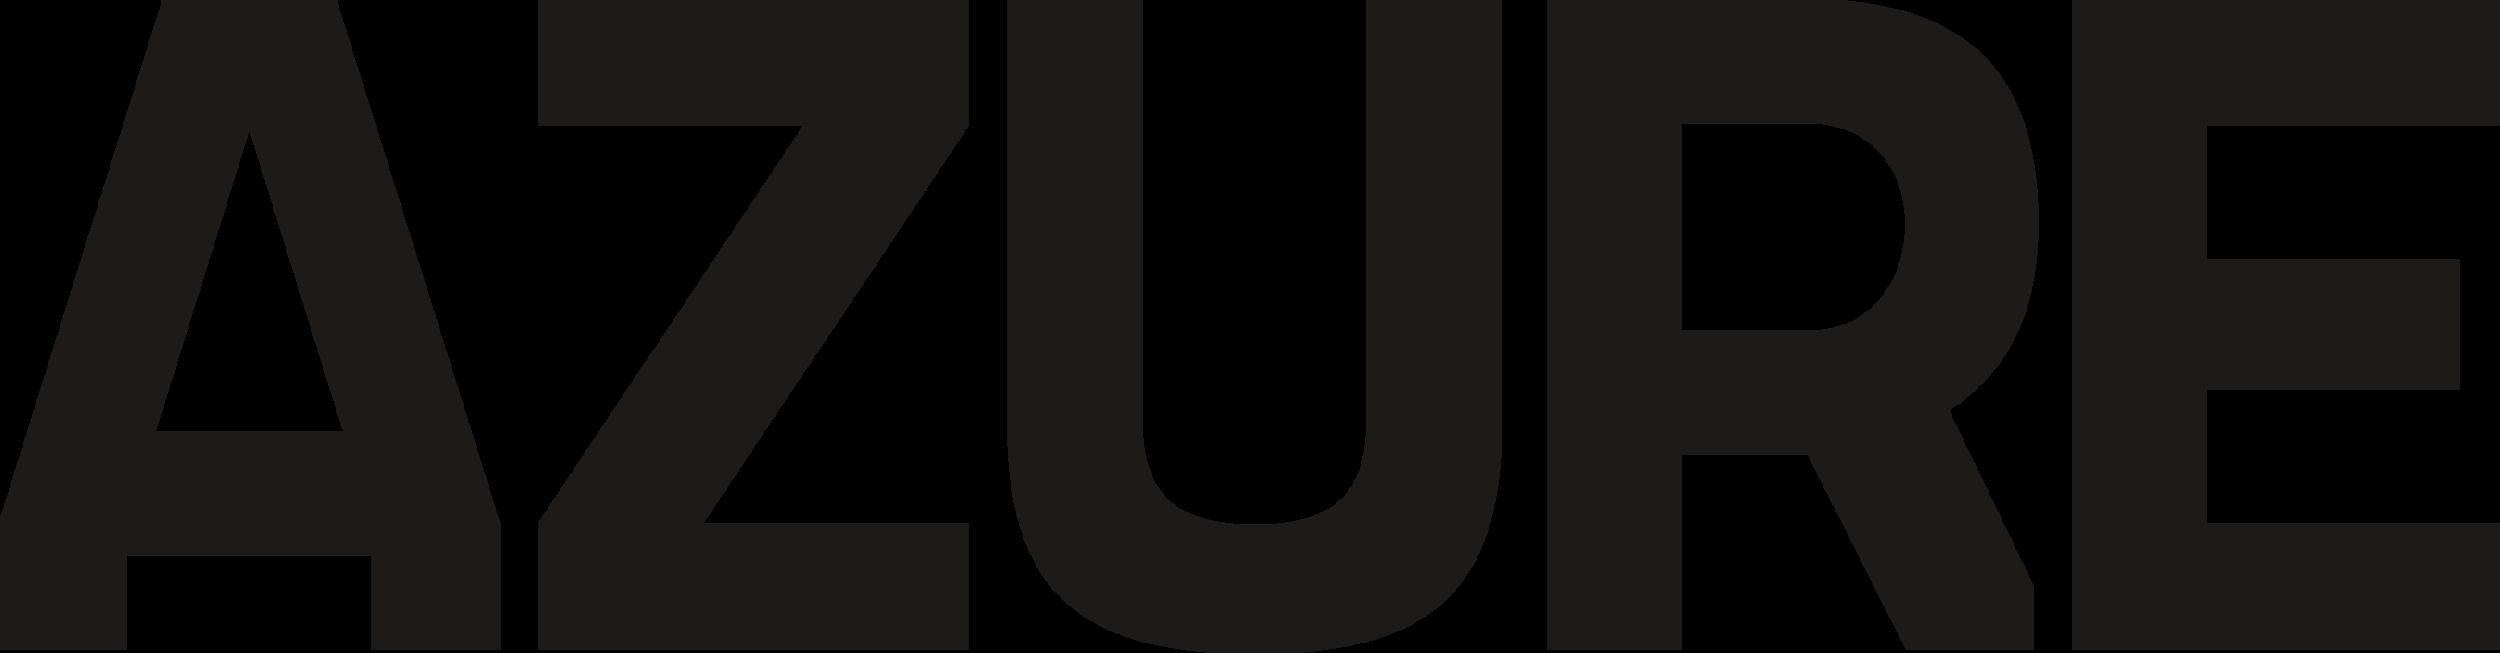 logo_notagline.png